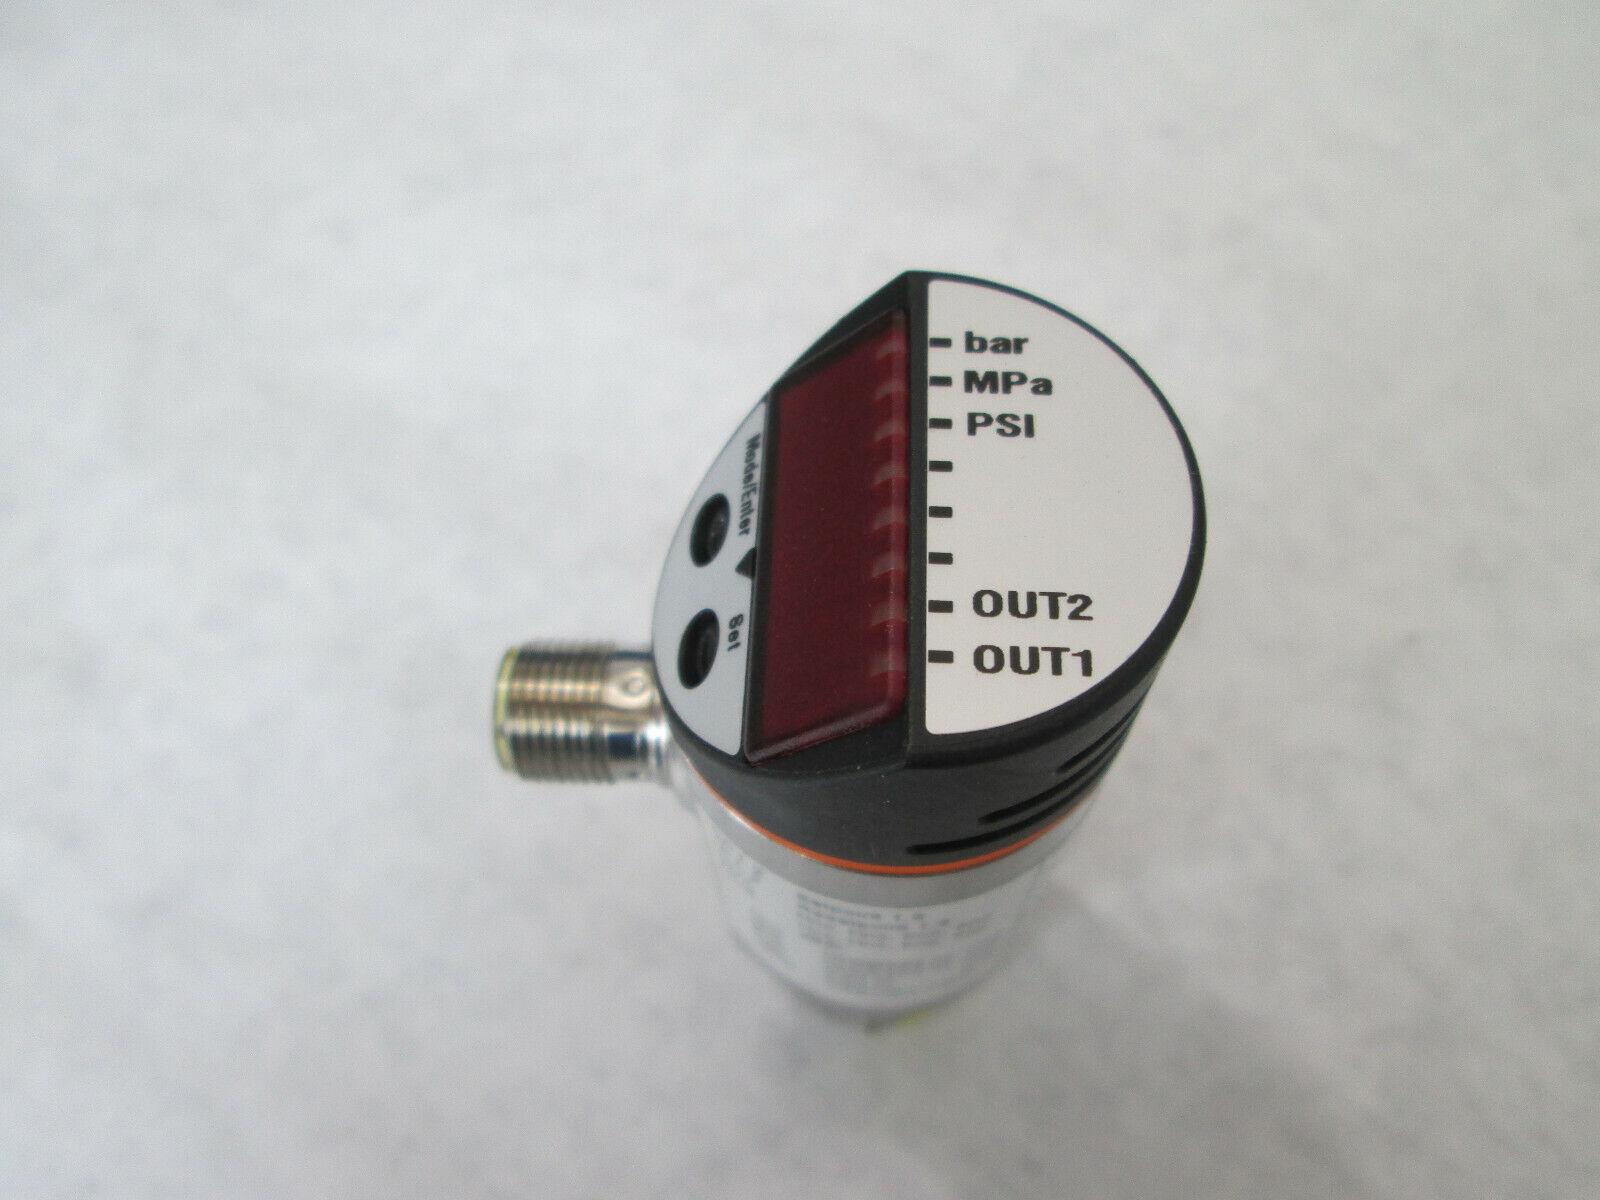 1pc ifm PN7004 Electronic Pressure Sensor for sale online